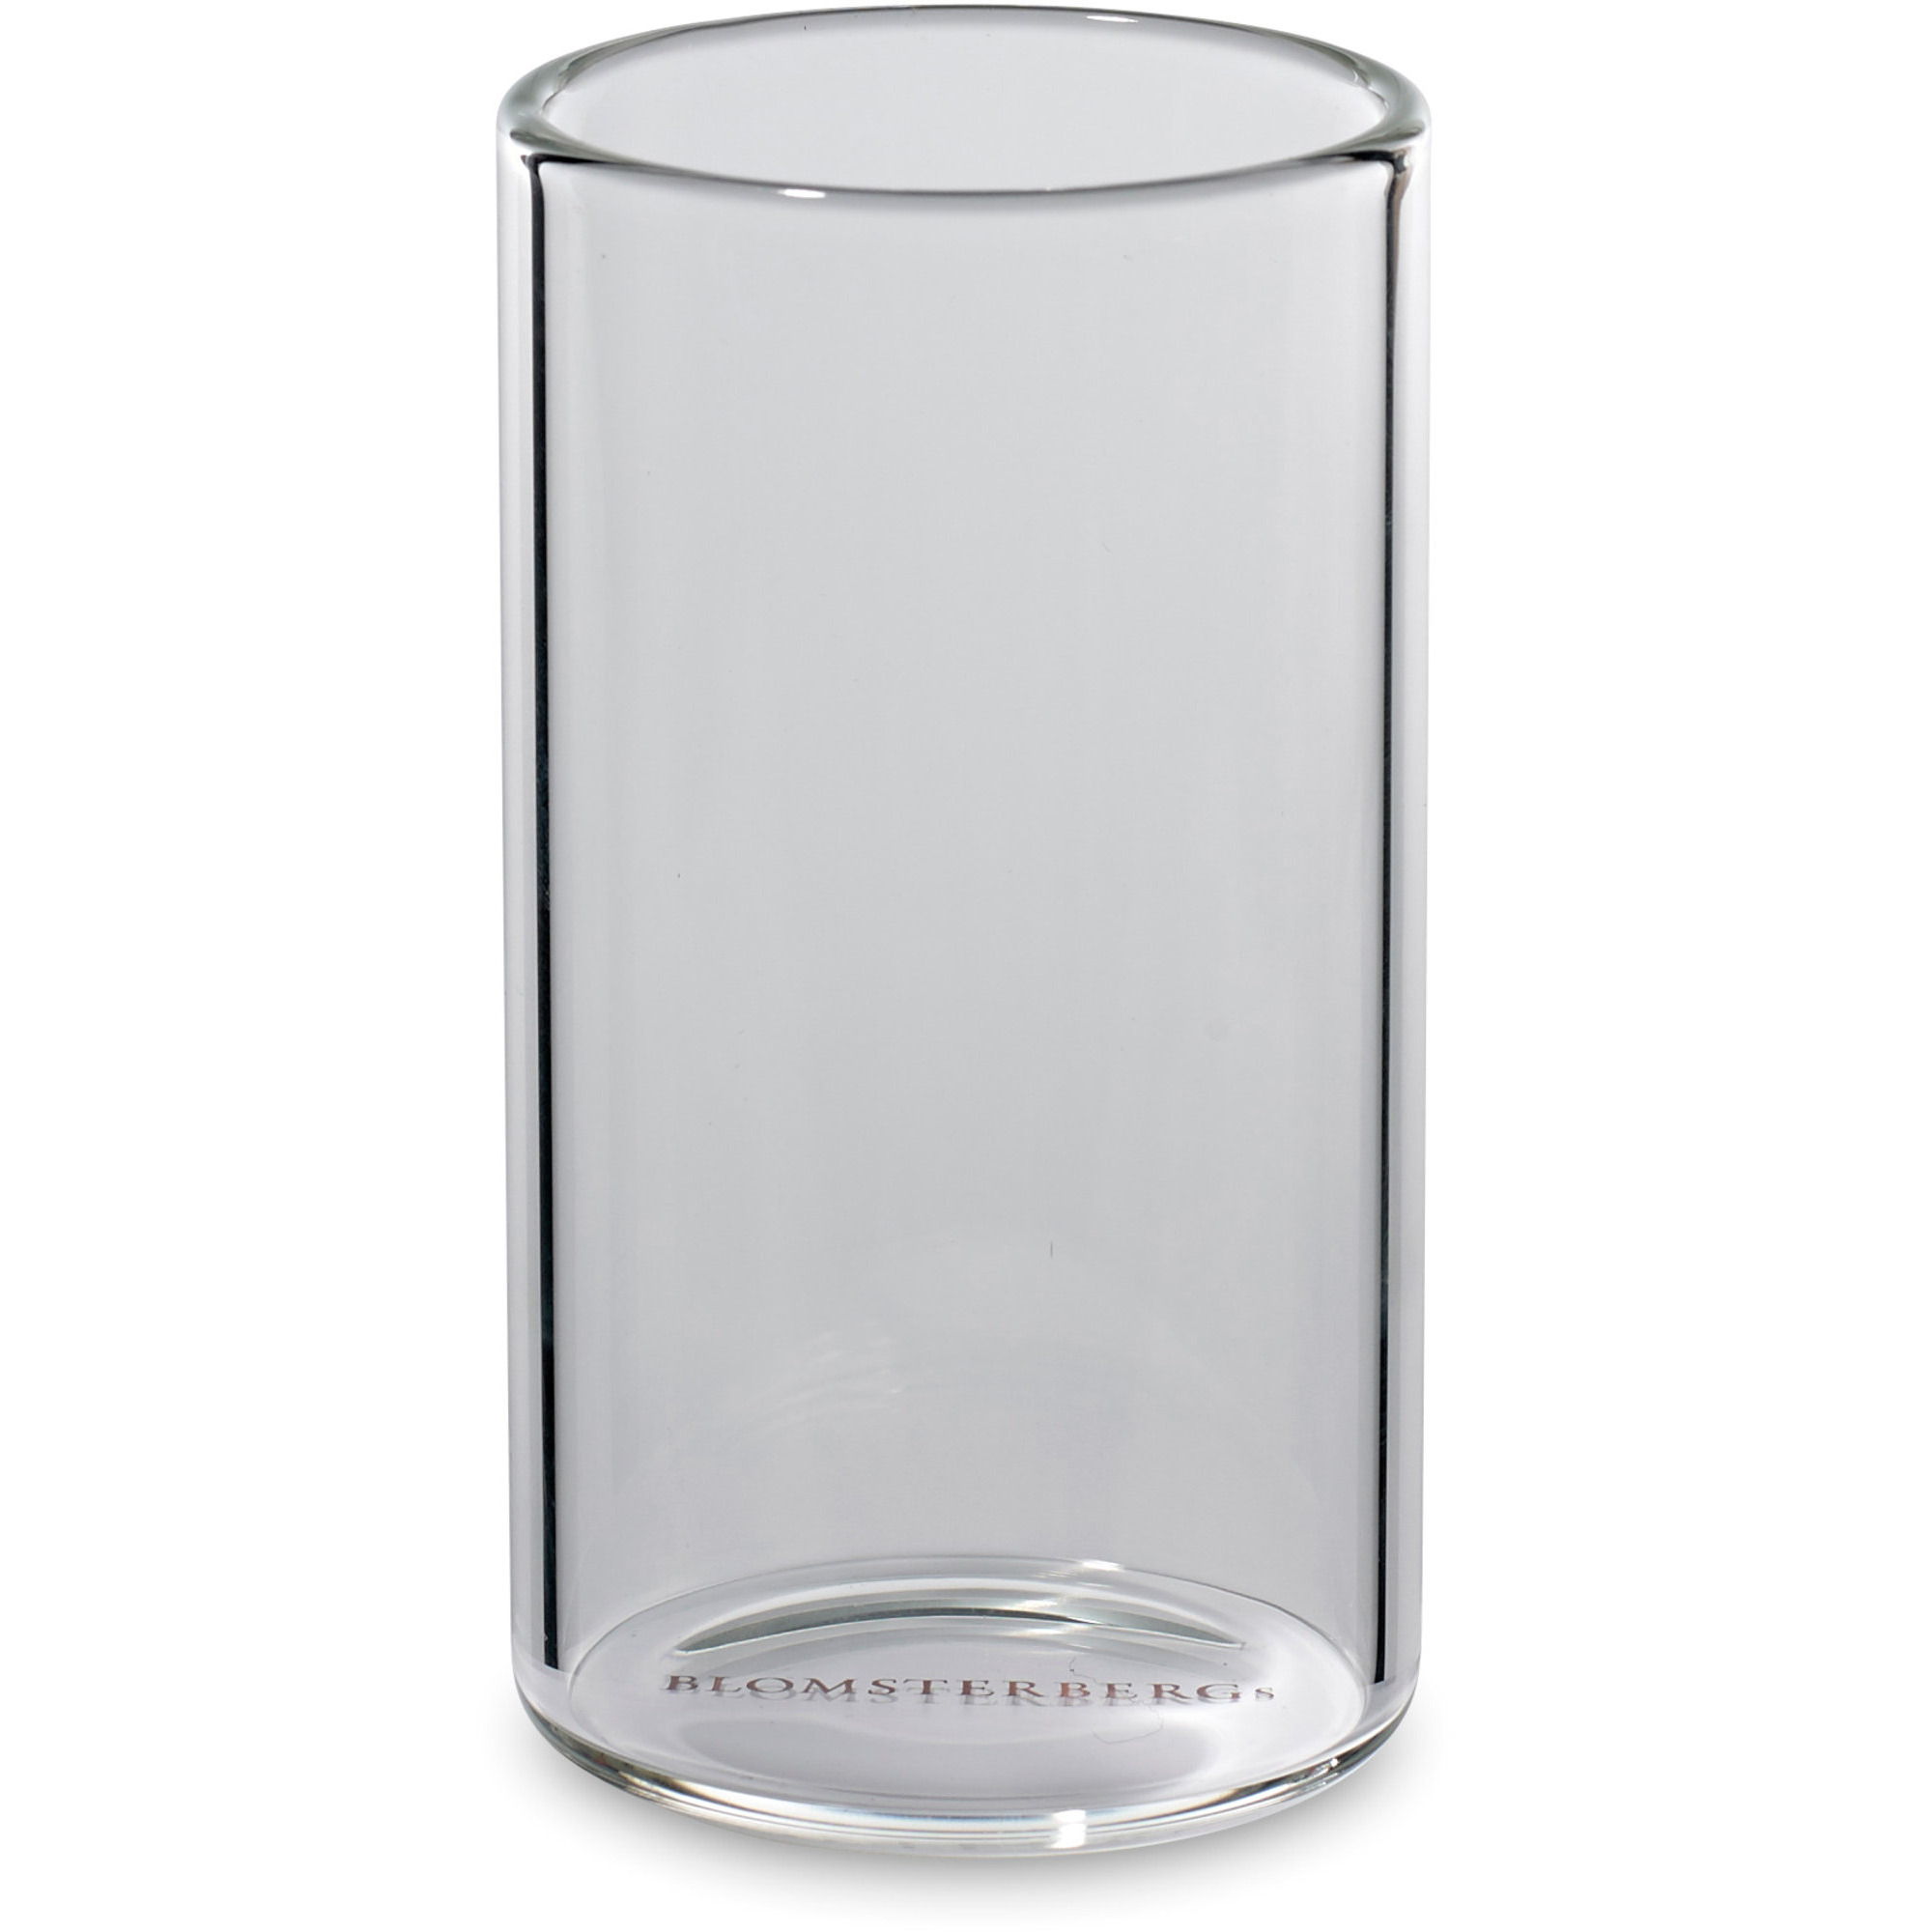 Blomsterbergs Serveringsglas Large 4 st